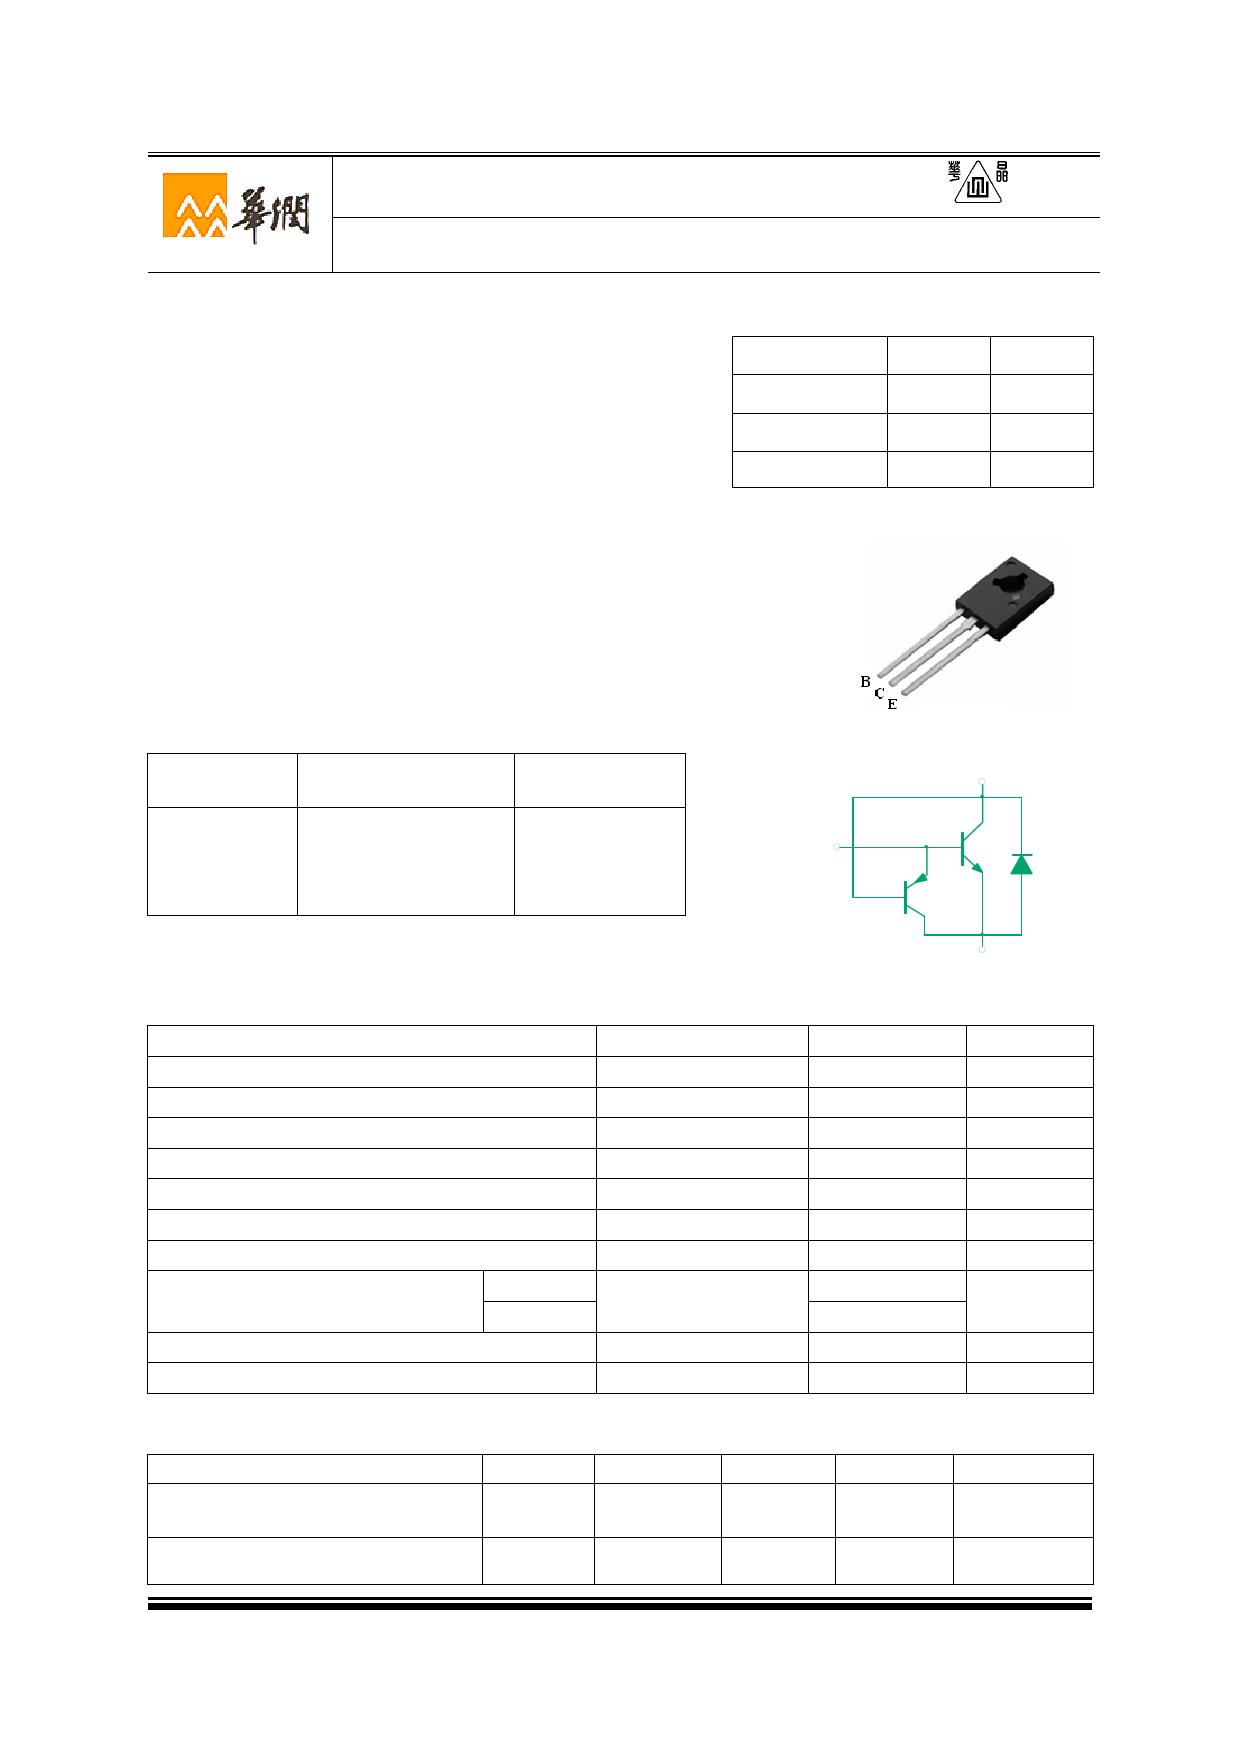 3DD13003J6D Datasheet, 3DD13003J6D PDF,ピン配置, 機能